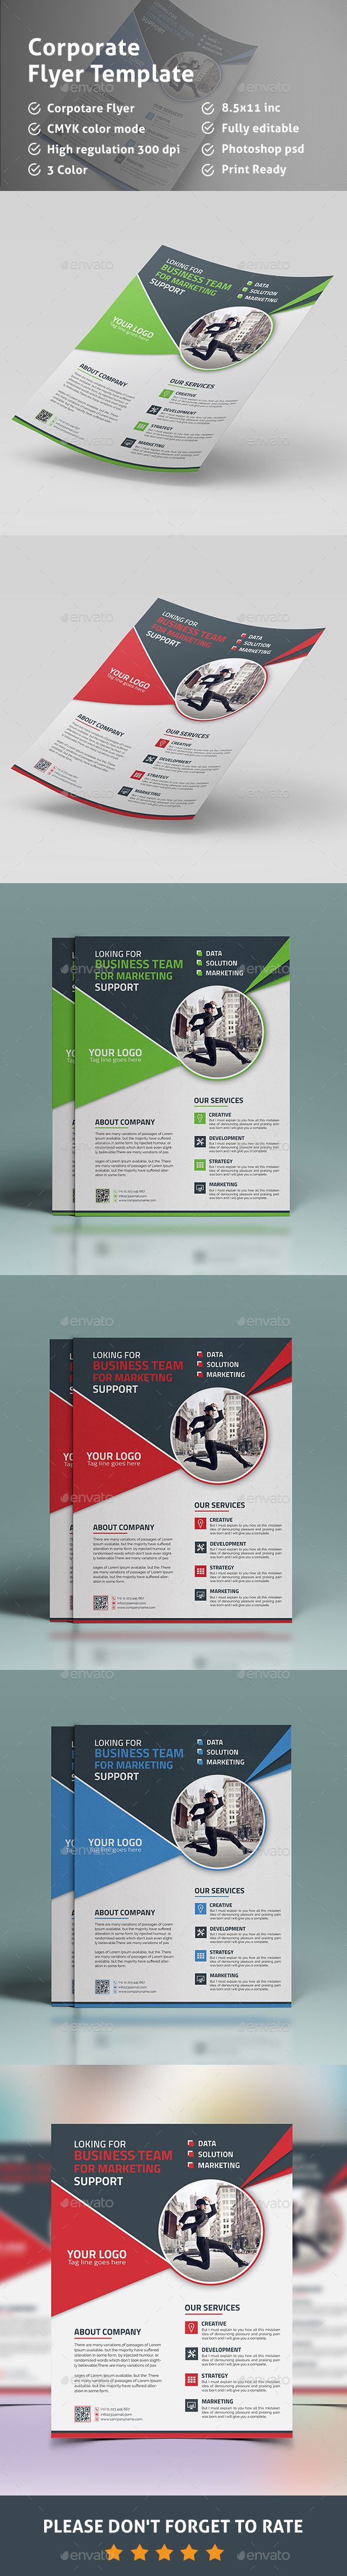 Flyer Template PSD #design Download: http://graphicriver.net/item ...